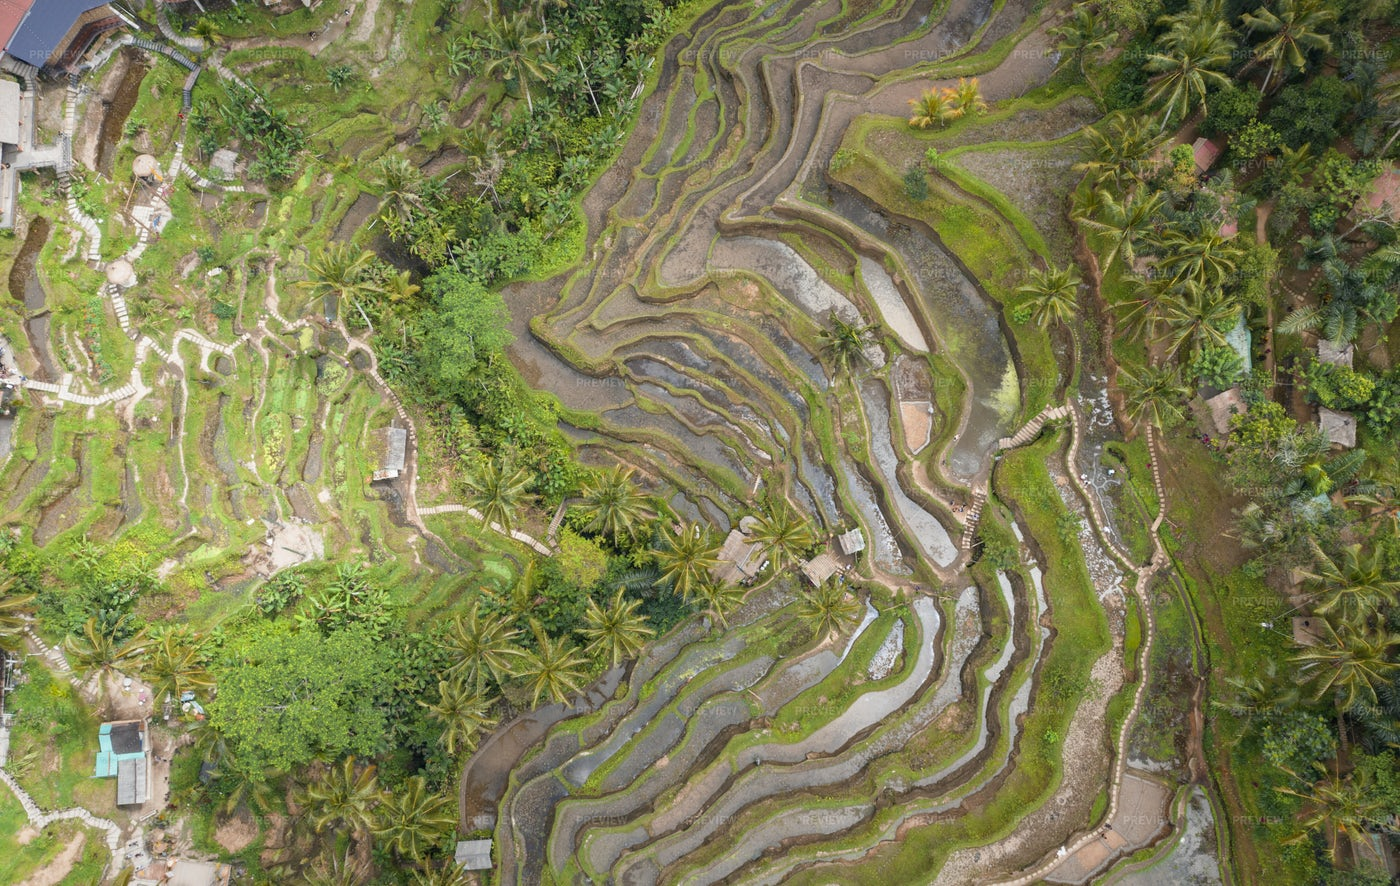 Aerial Of Tegalalang Rice Terrace: Stock Photos